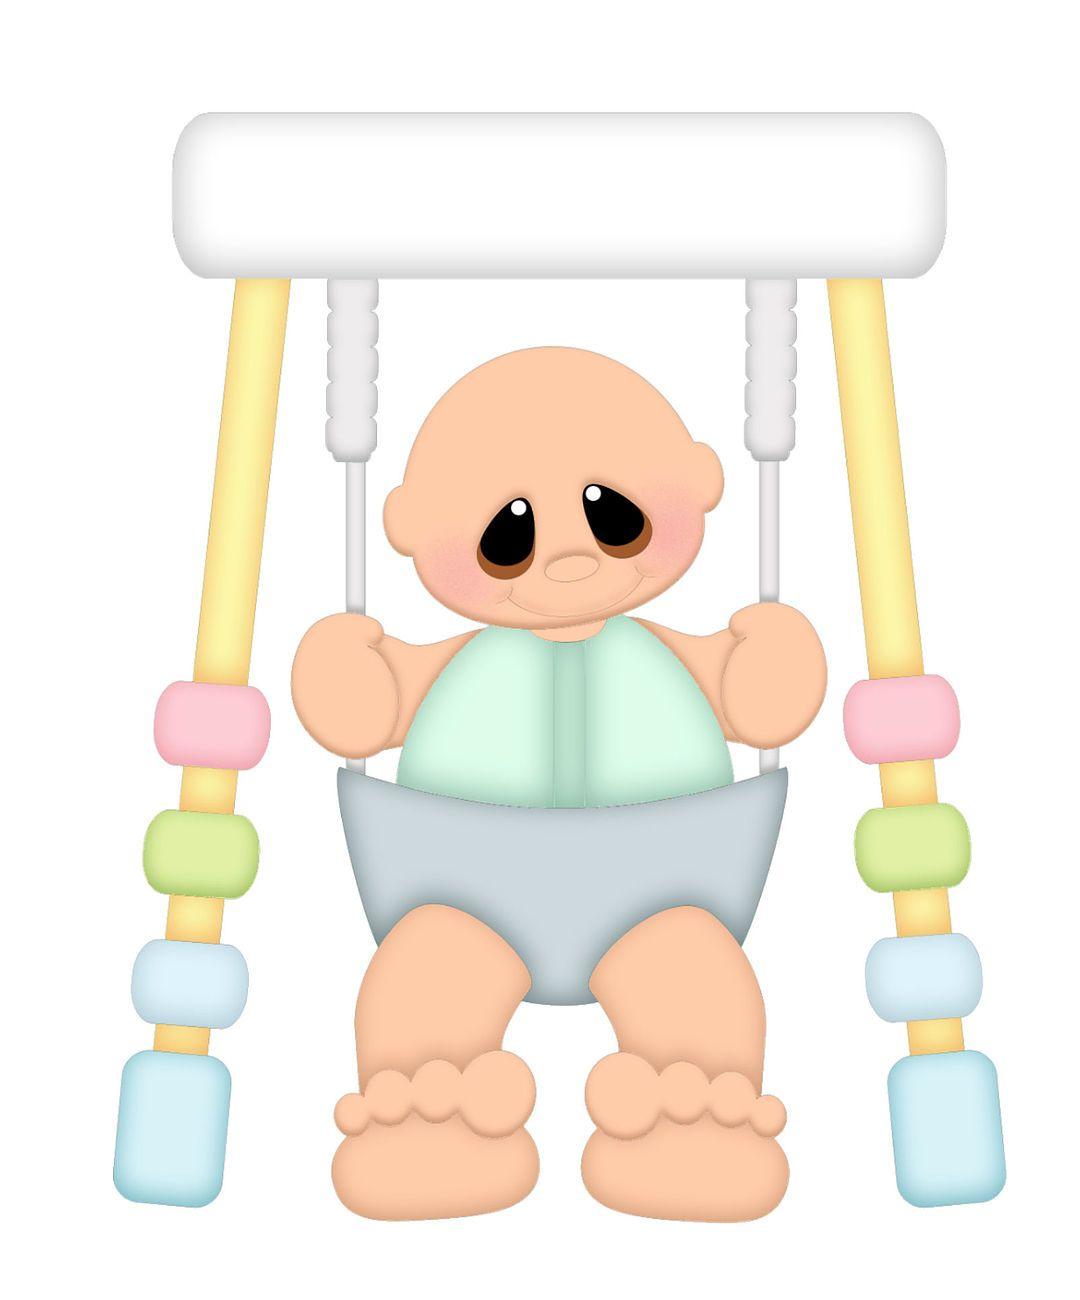 Bebe Gestante Baby Scrapbook Baby Cards New Baby Products